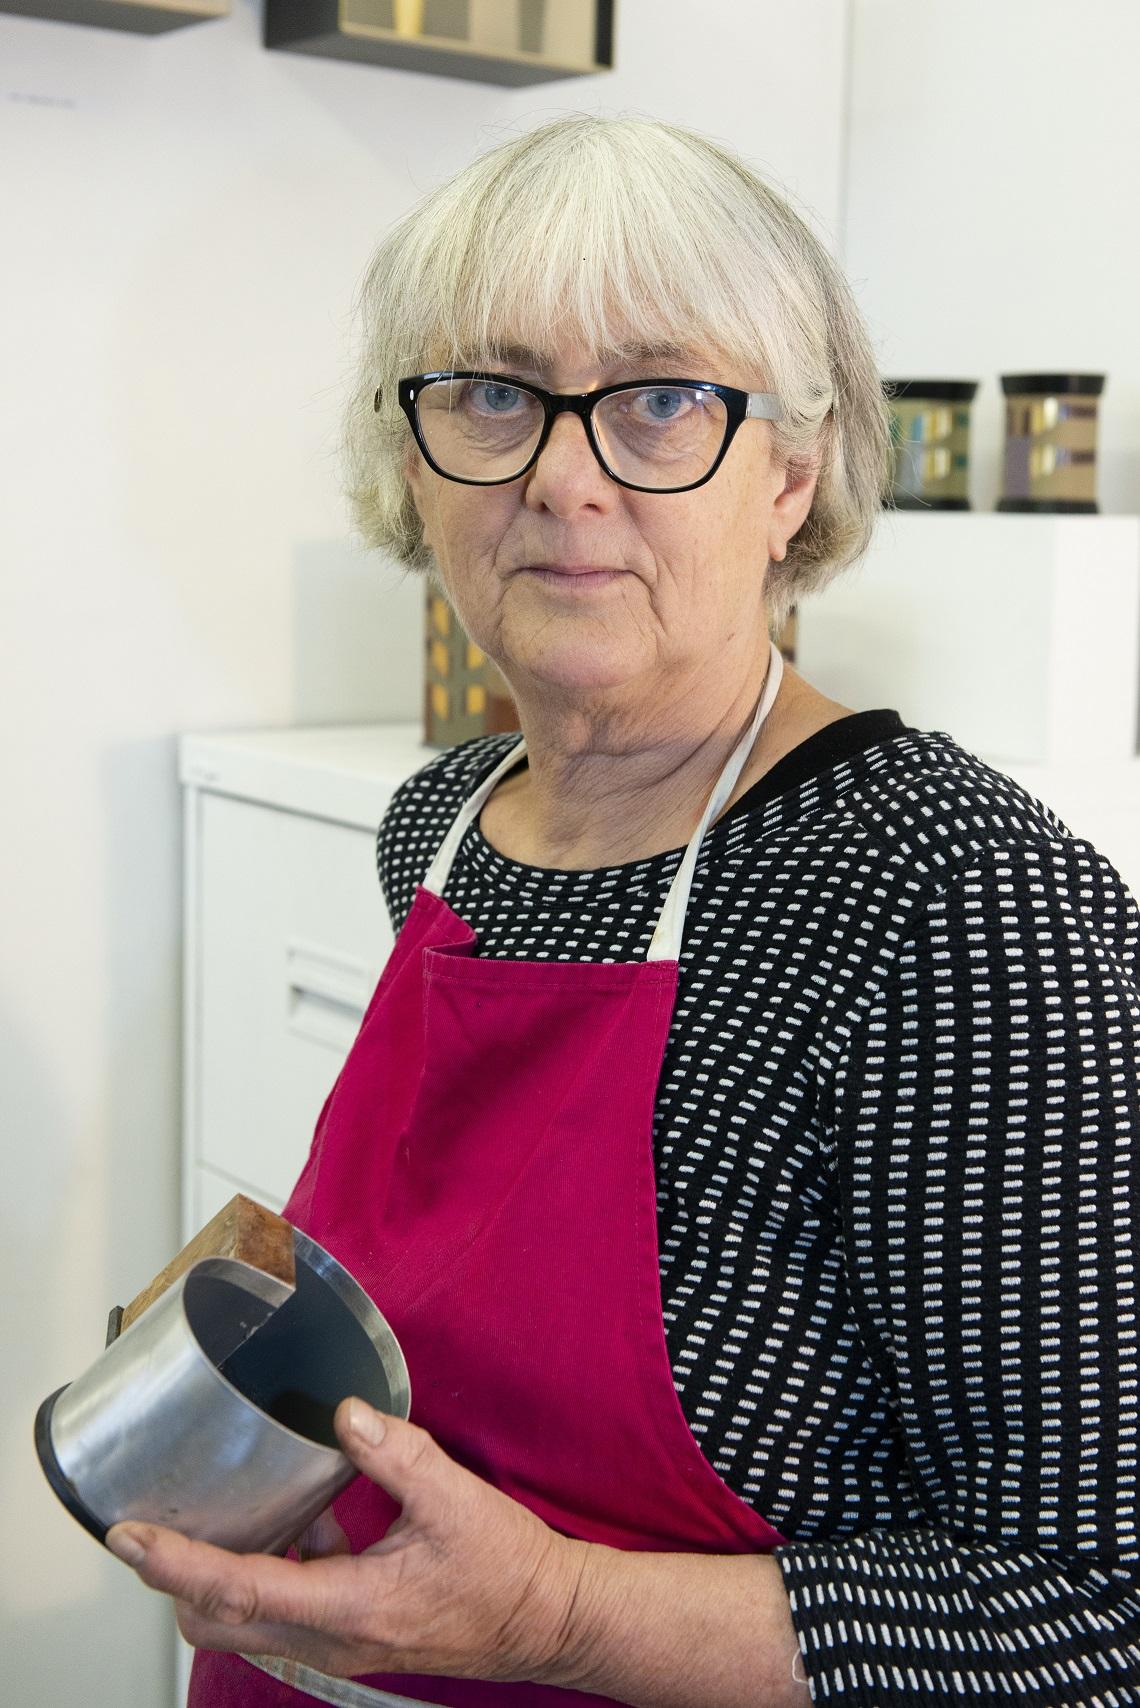 Mette Fruergaard-Jensen Face.jpg